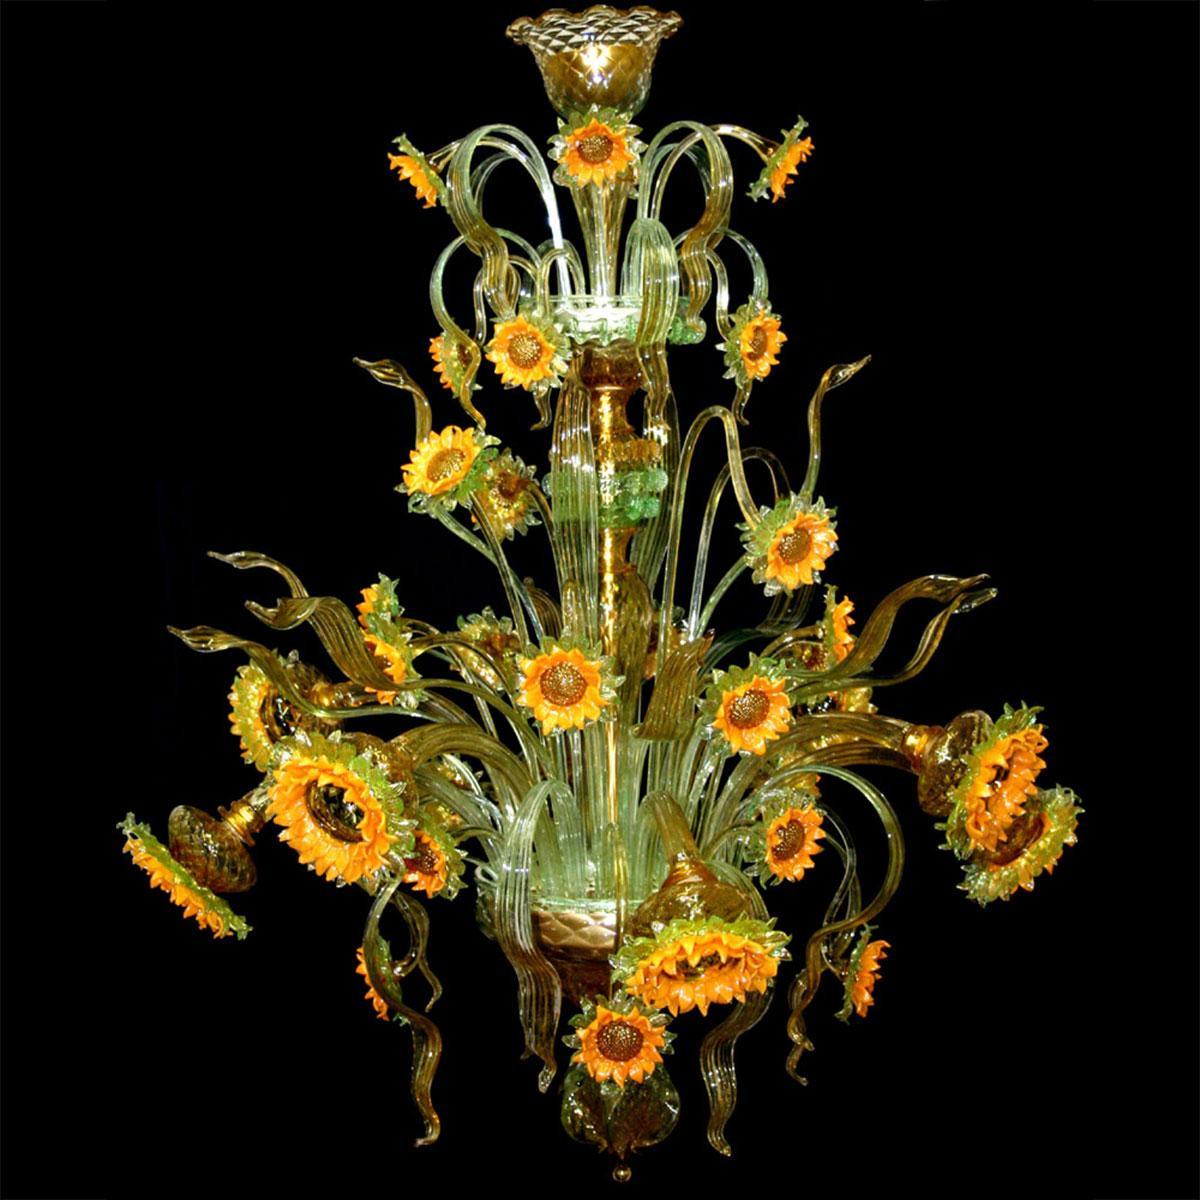 """Girasoli di Van Gogh"" lustre en cristal de Murano - 8 lumières - tournesol jaune"